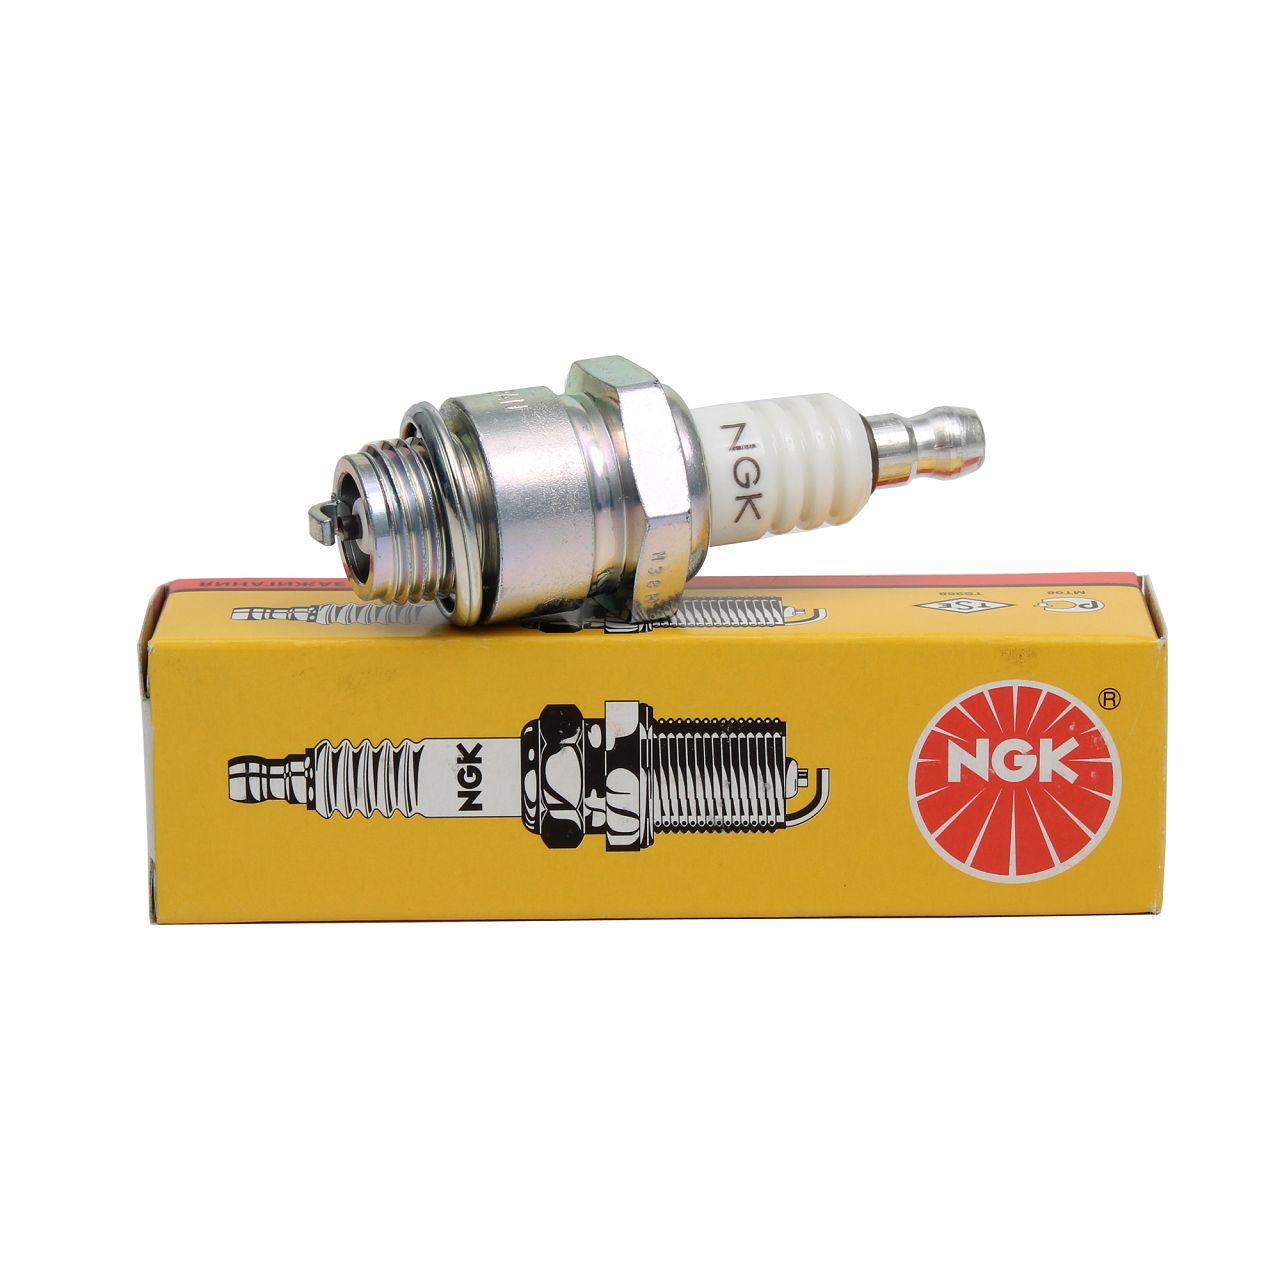 NGK Zündkerze 3410 B4LM für Kleinmotoren Gartengeräte Rasenmäher Motorsäge